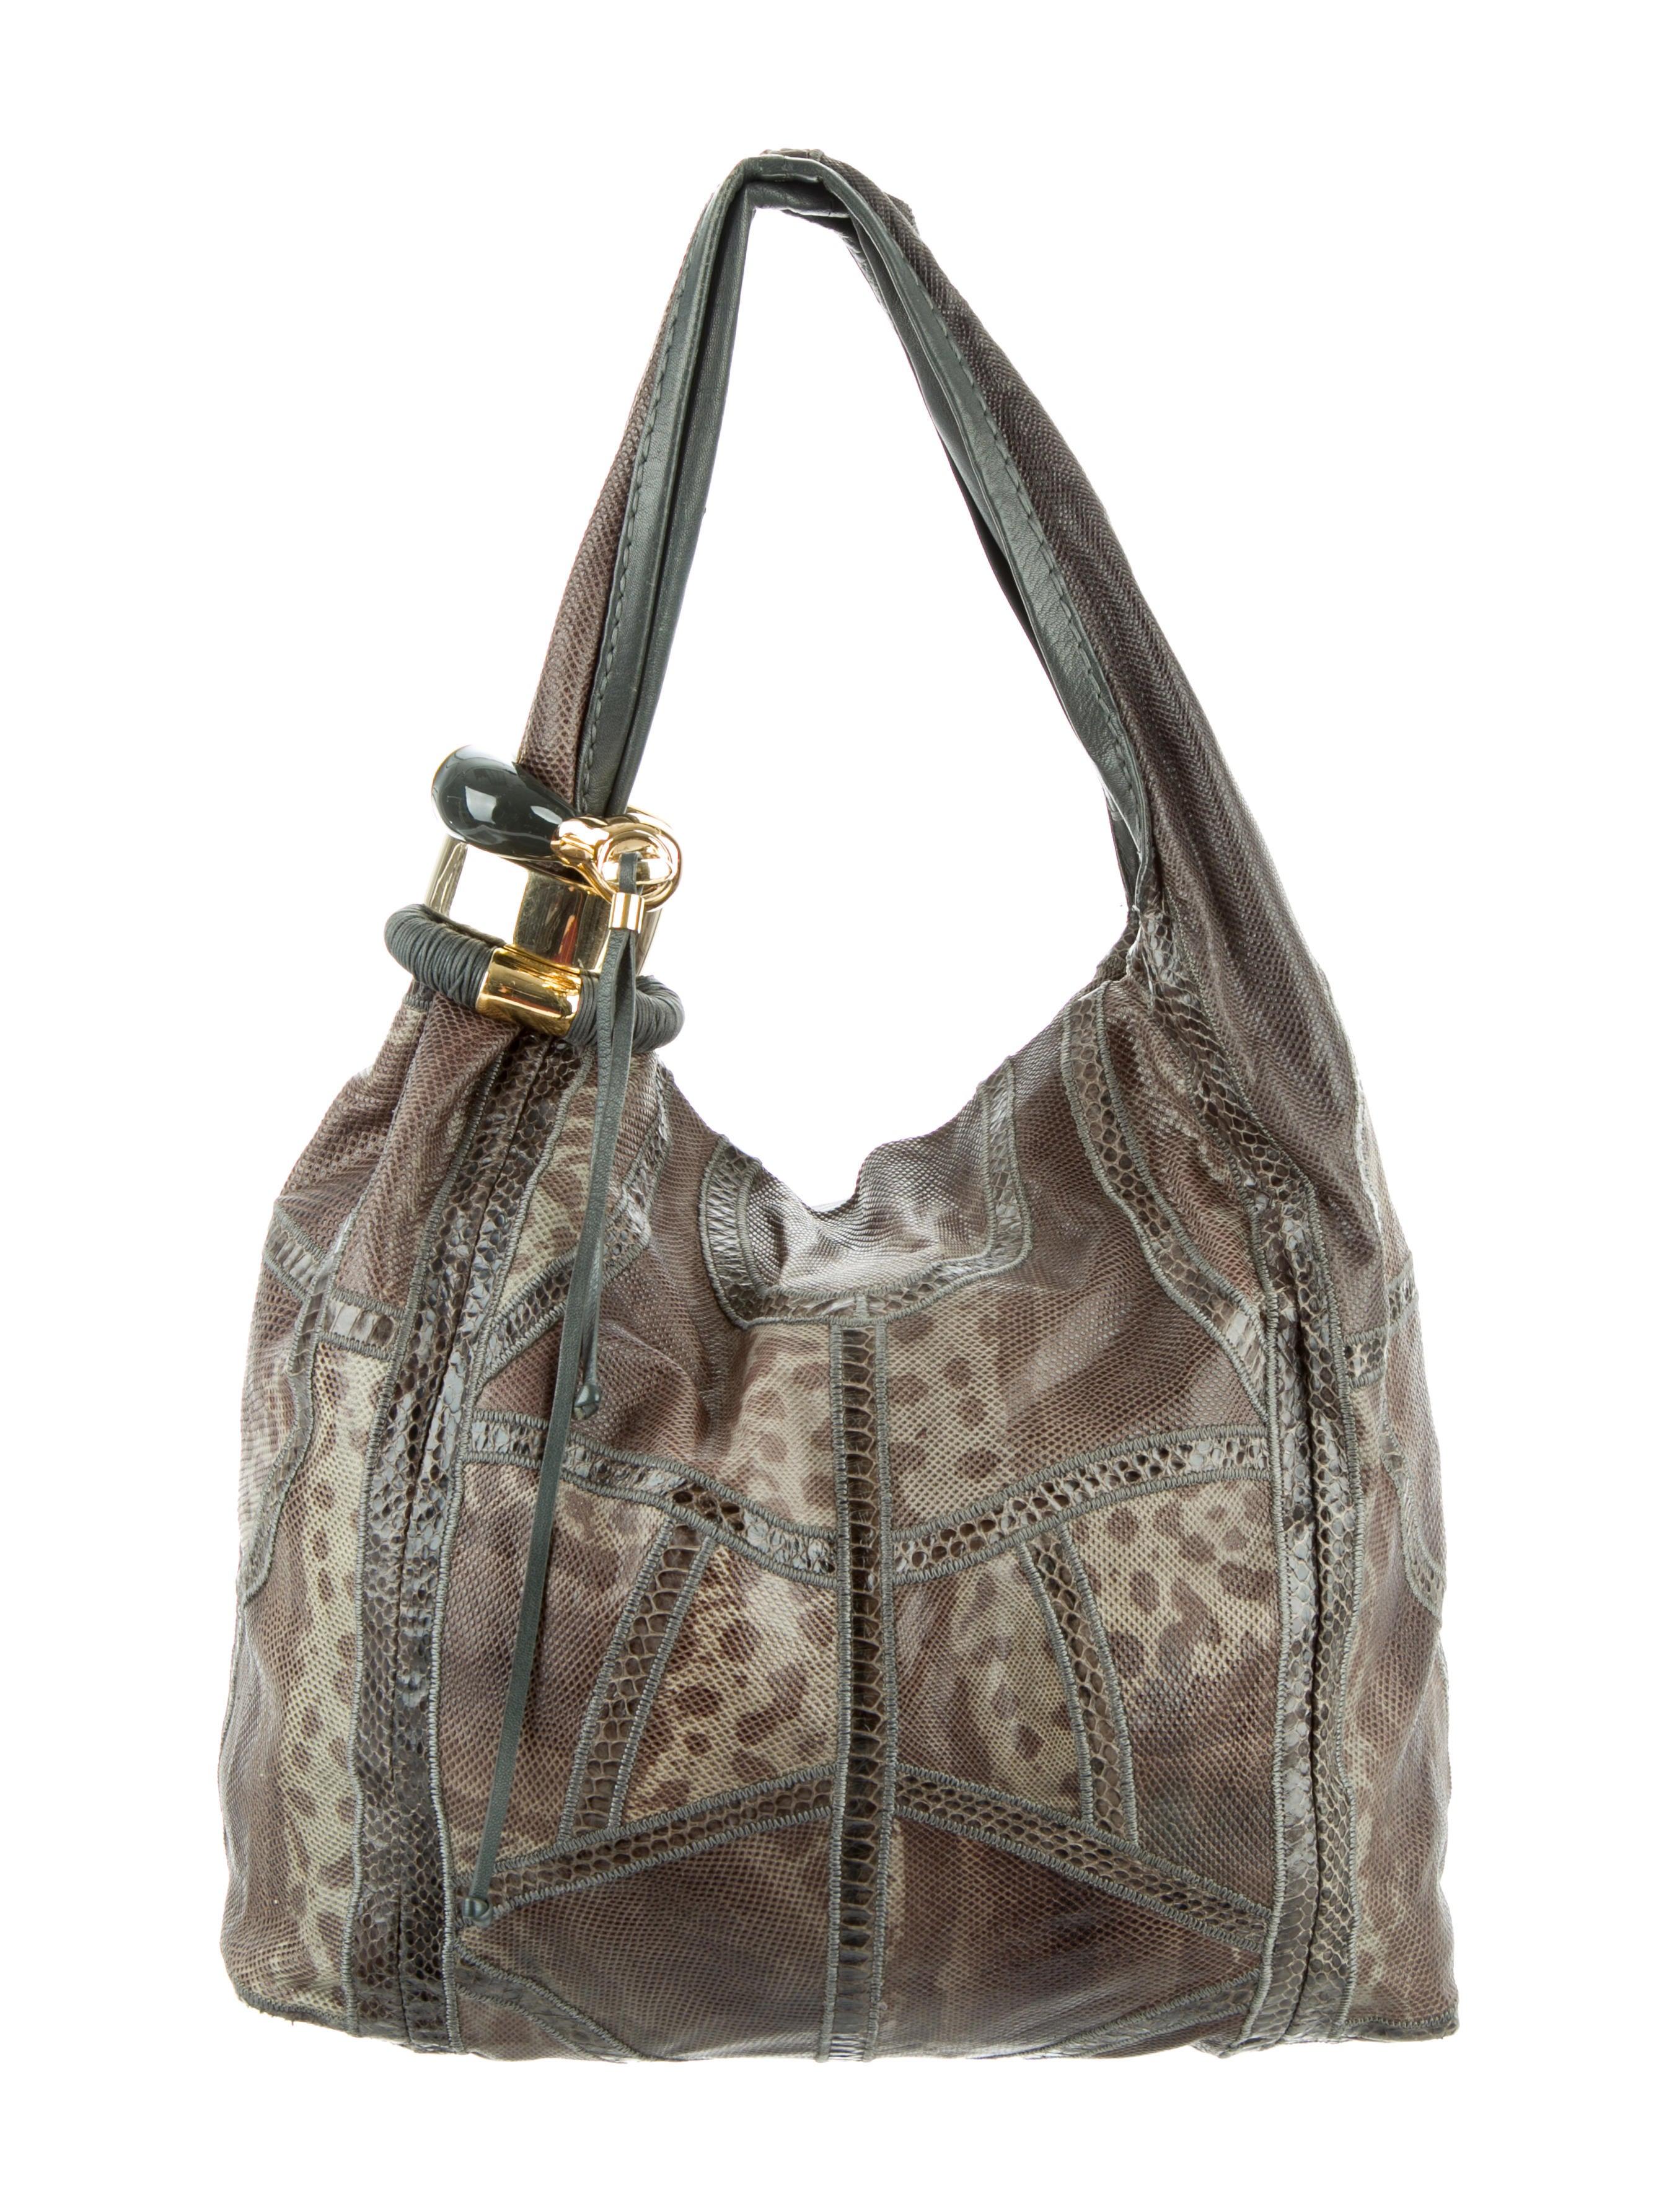 Snakeskin Saba Bag